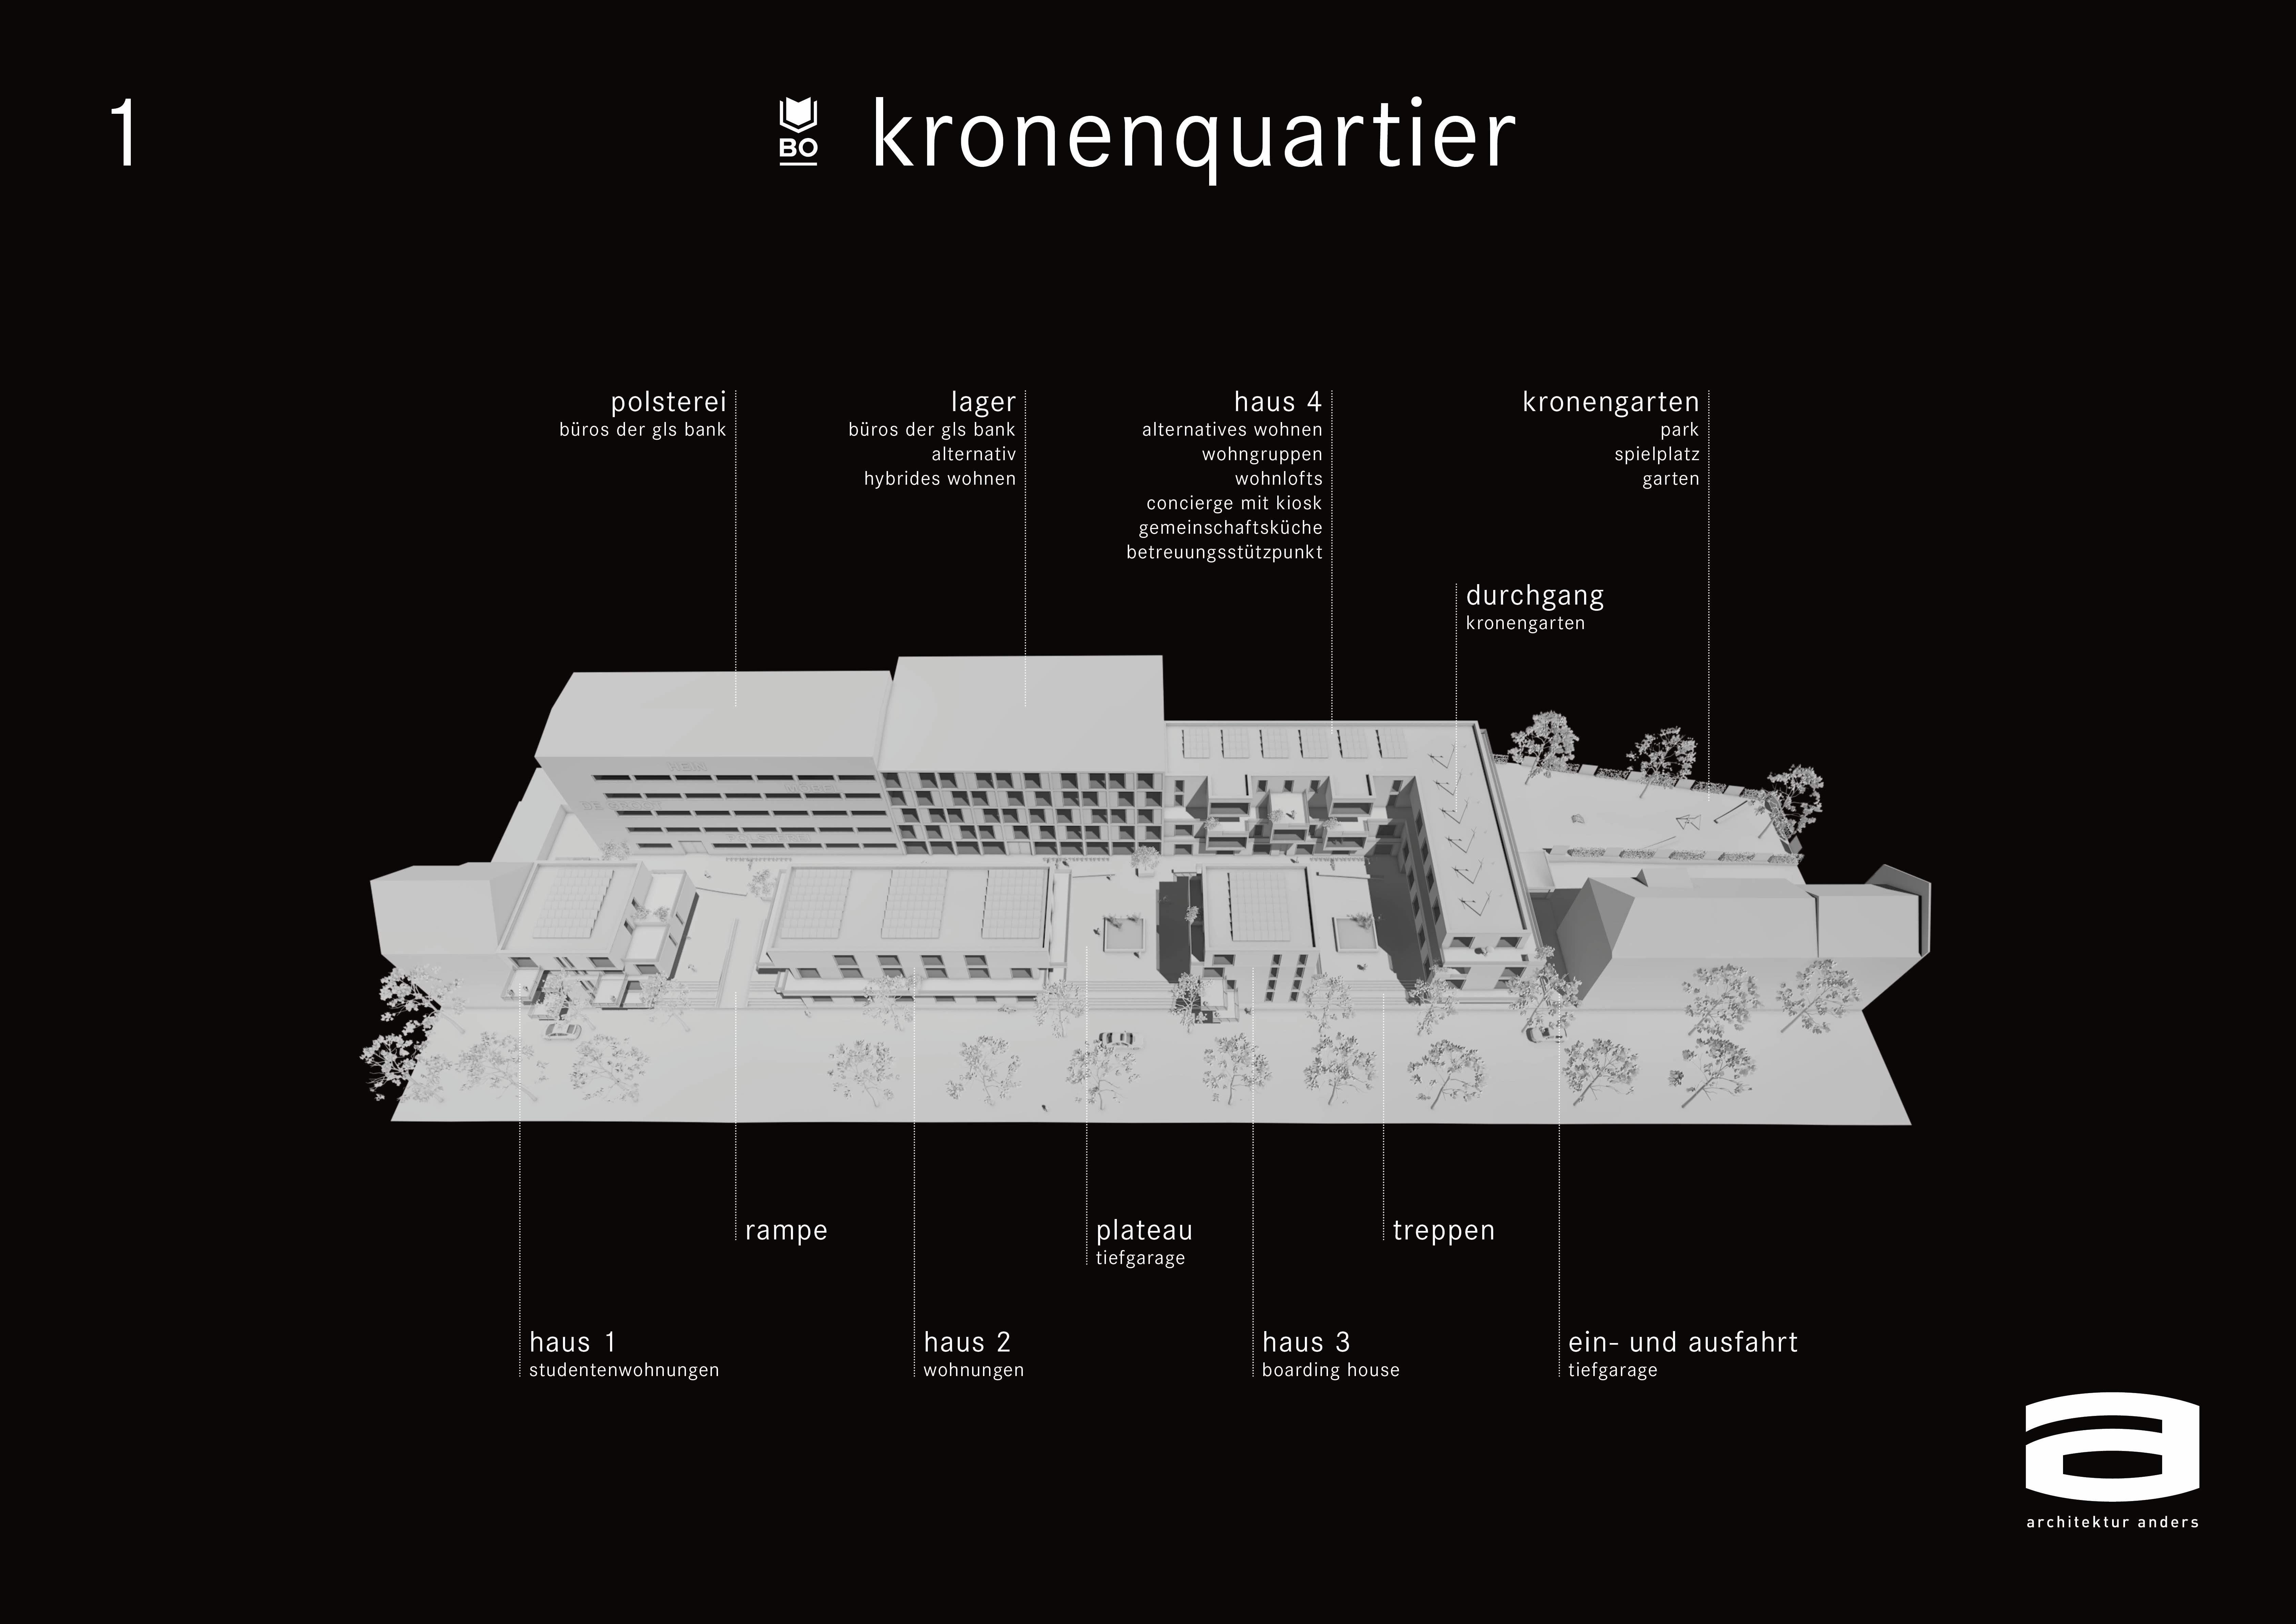 https://architektur-anders.de/wp-content/uploads/2018/06/architektur-anders_BO-kronenquartier_2015_1.jpg